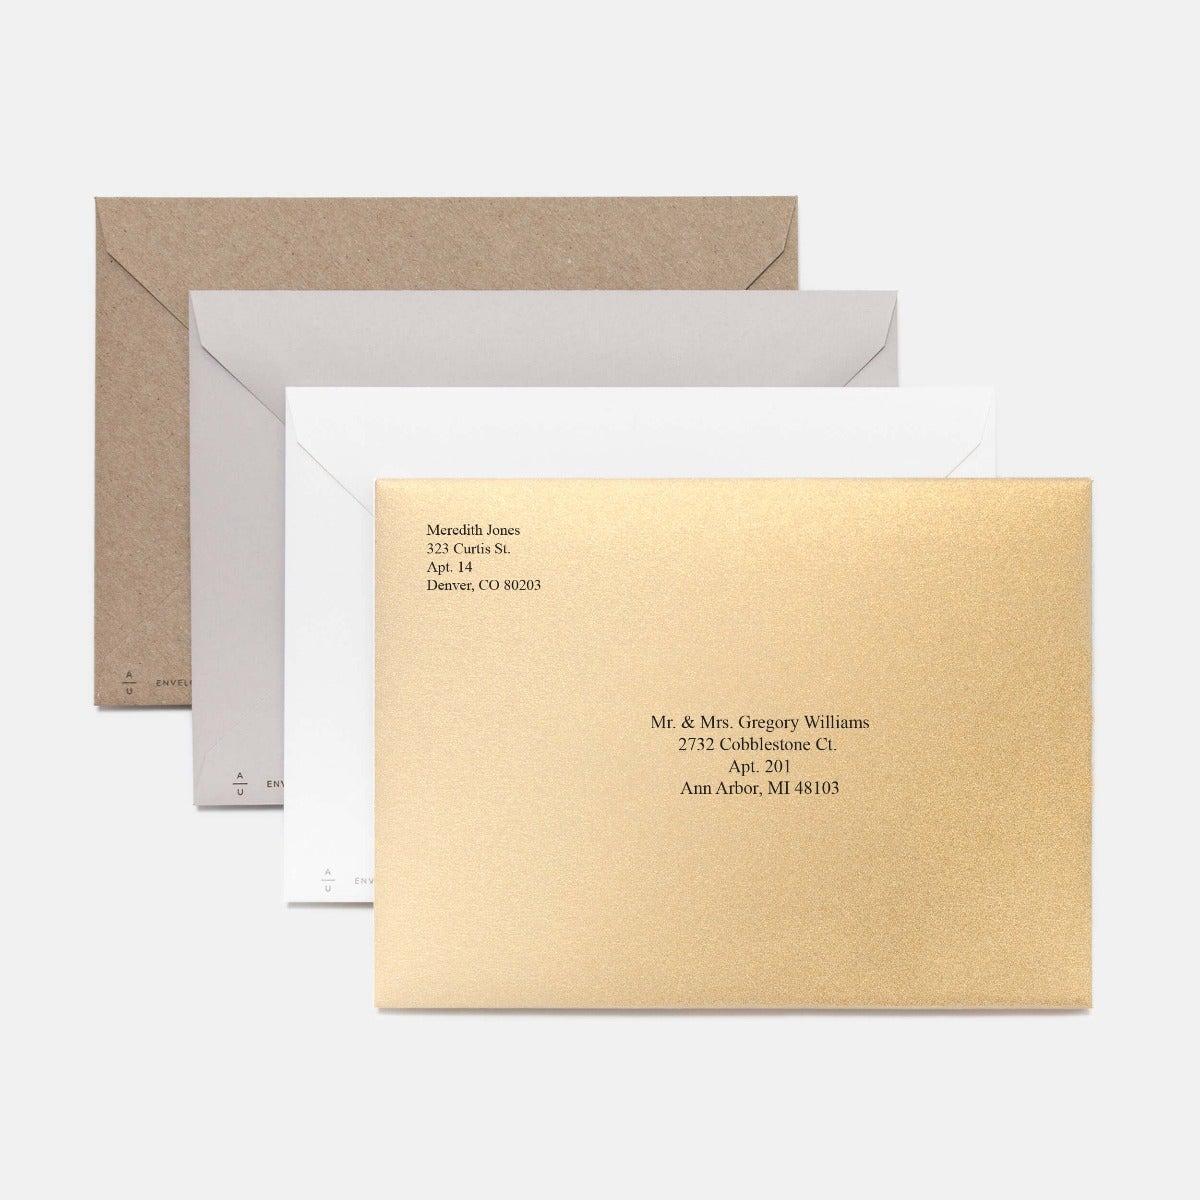 Festive Pine Holiday Card